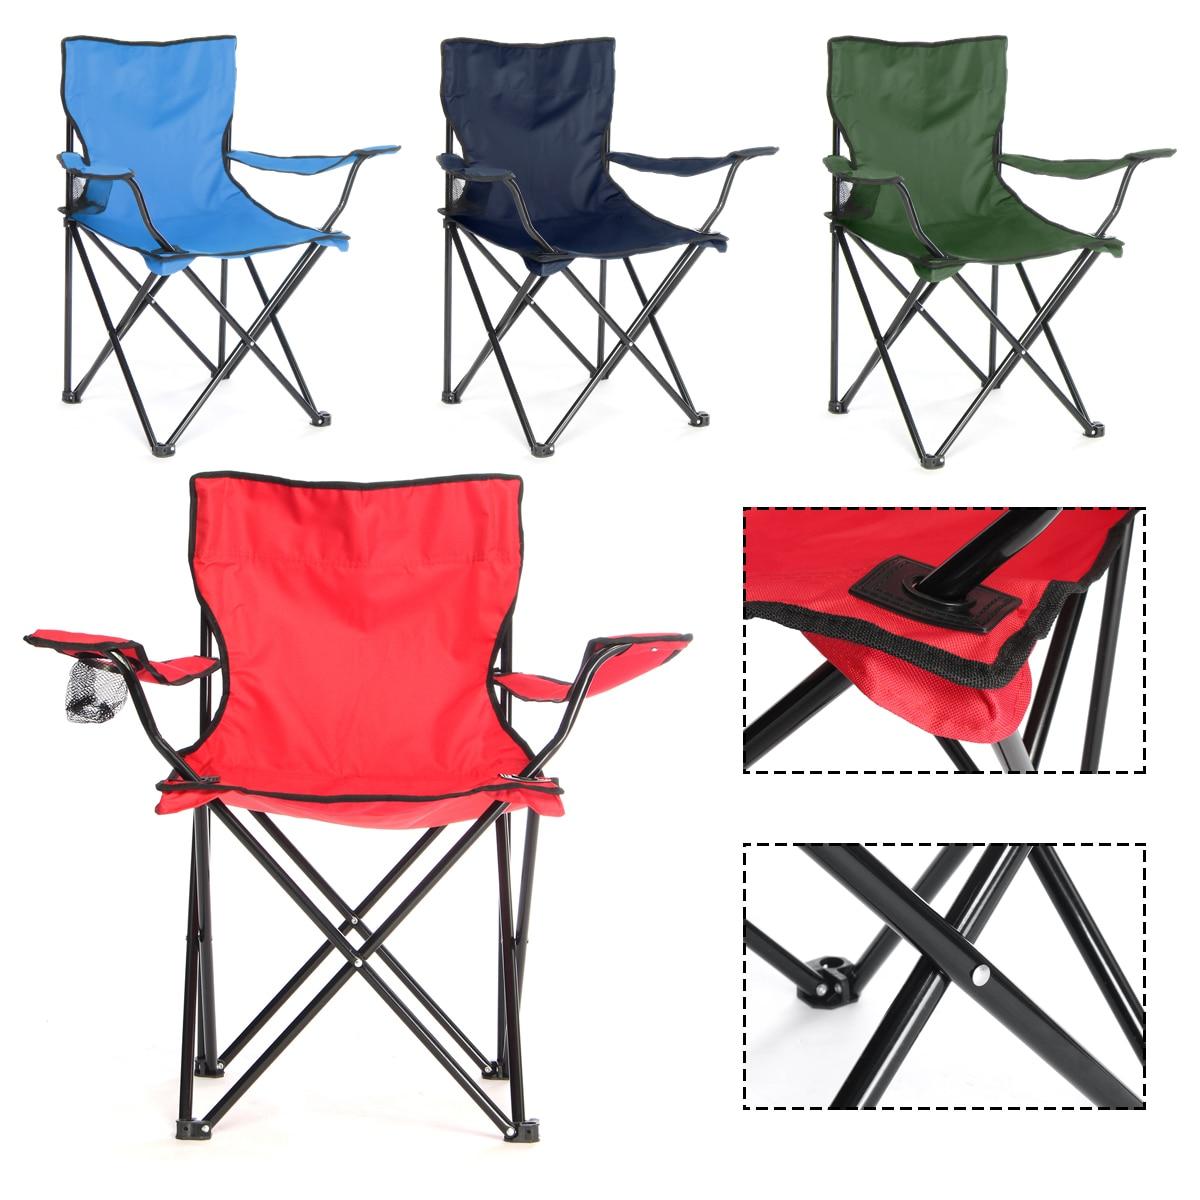 Highlander Traquair Chaise de Camping Pliante